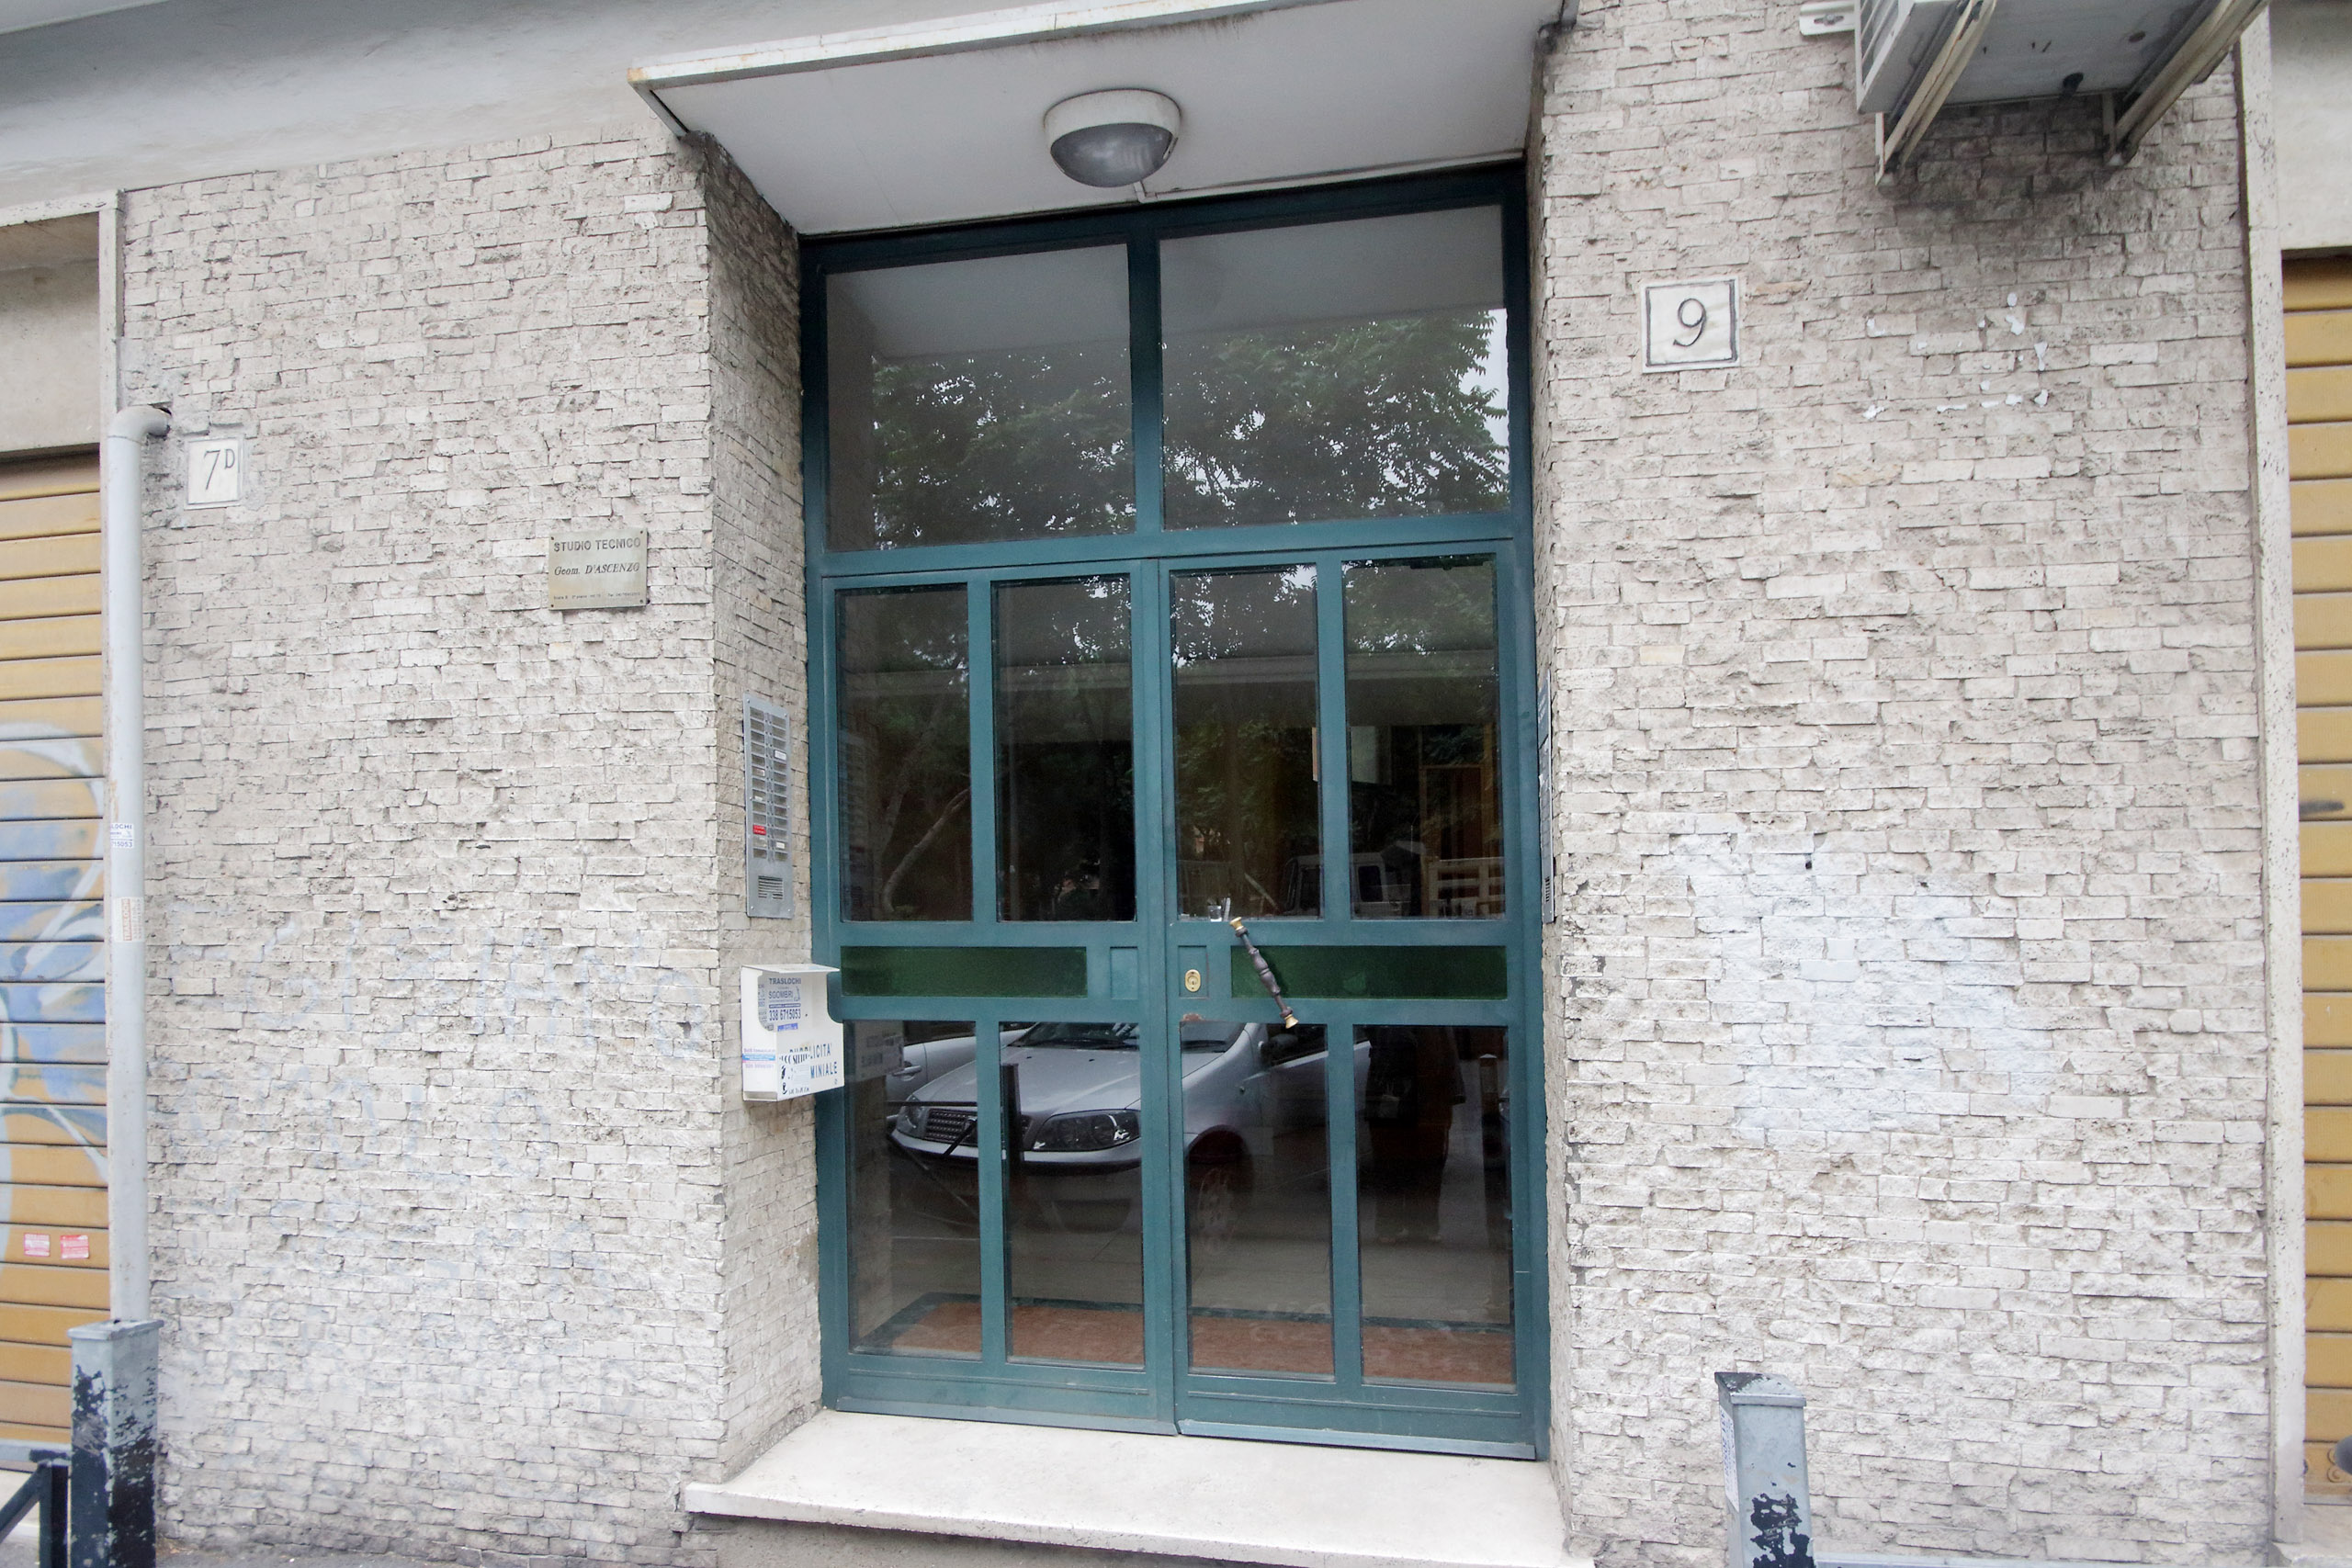 www.lillihouse.com - Lillihouse | Via Cincinnato 9, 00175 Roma (IT) | info@lillihouse.com - Gallery - immagine 112